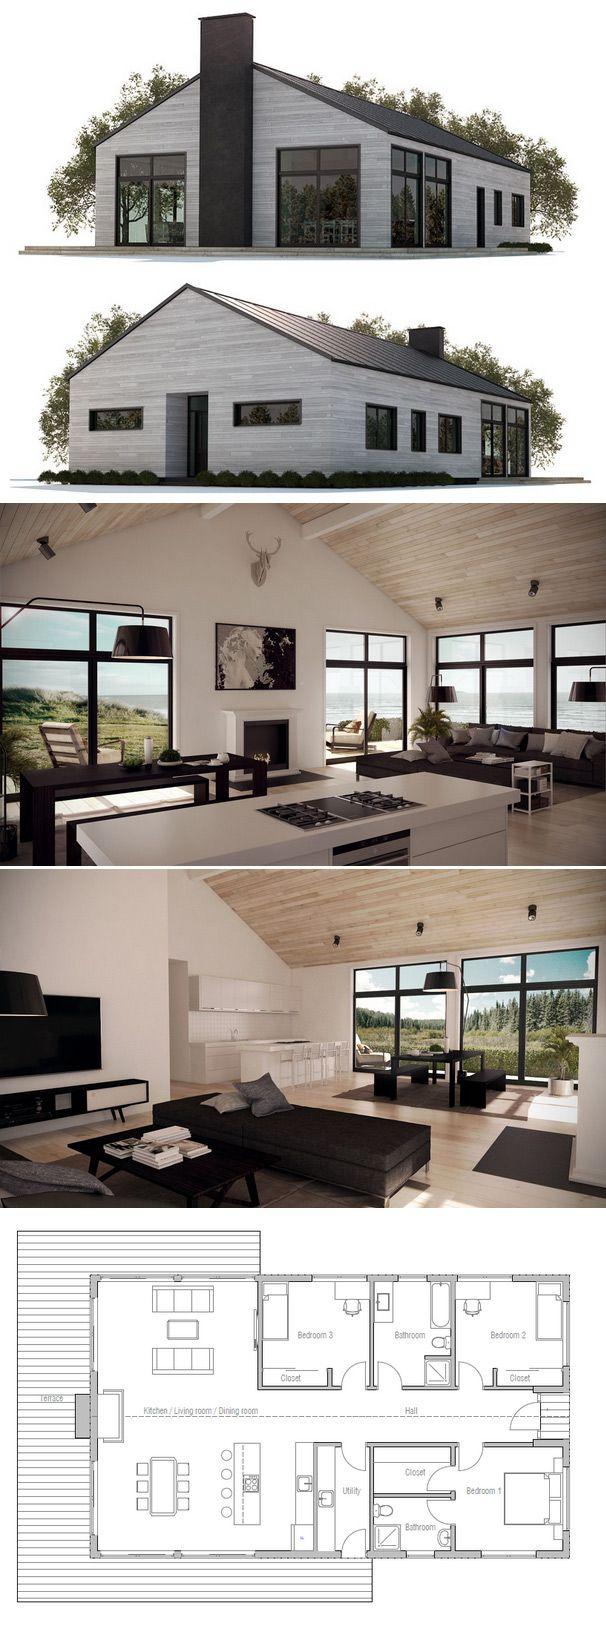 Plan de maison httpwww m habitat frtravaux